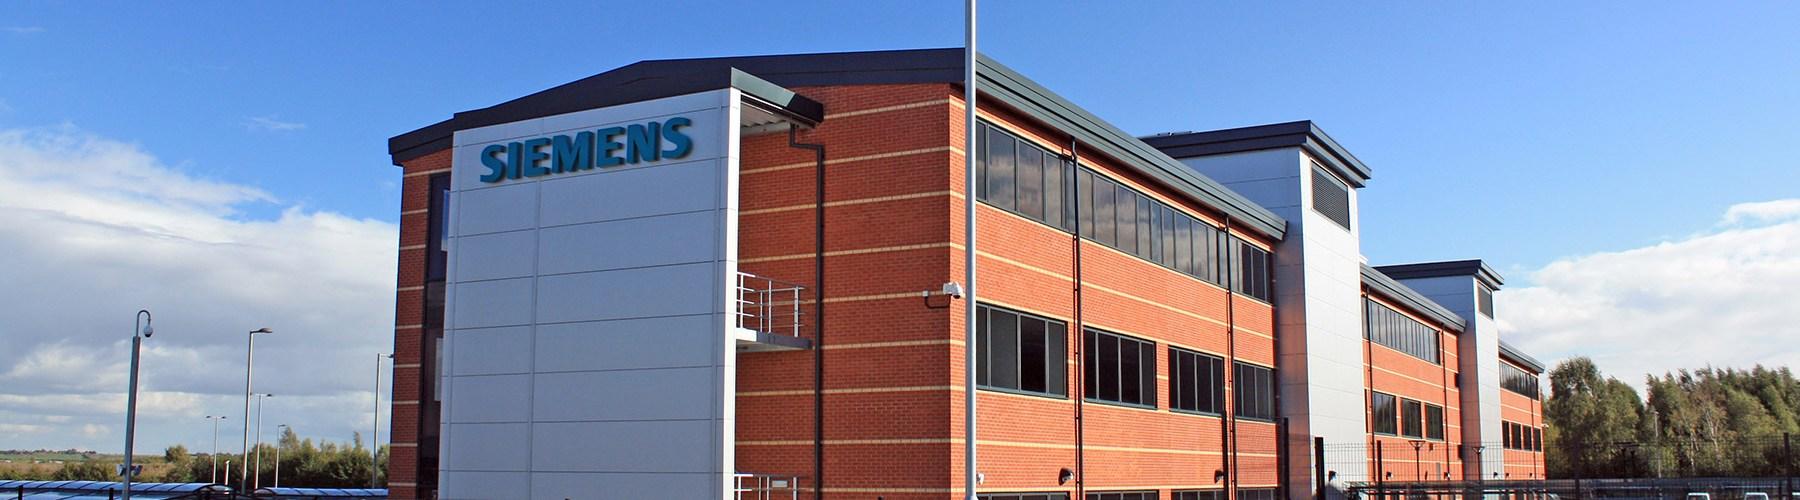 Siemens at LN6